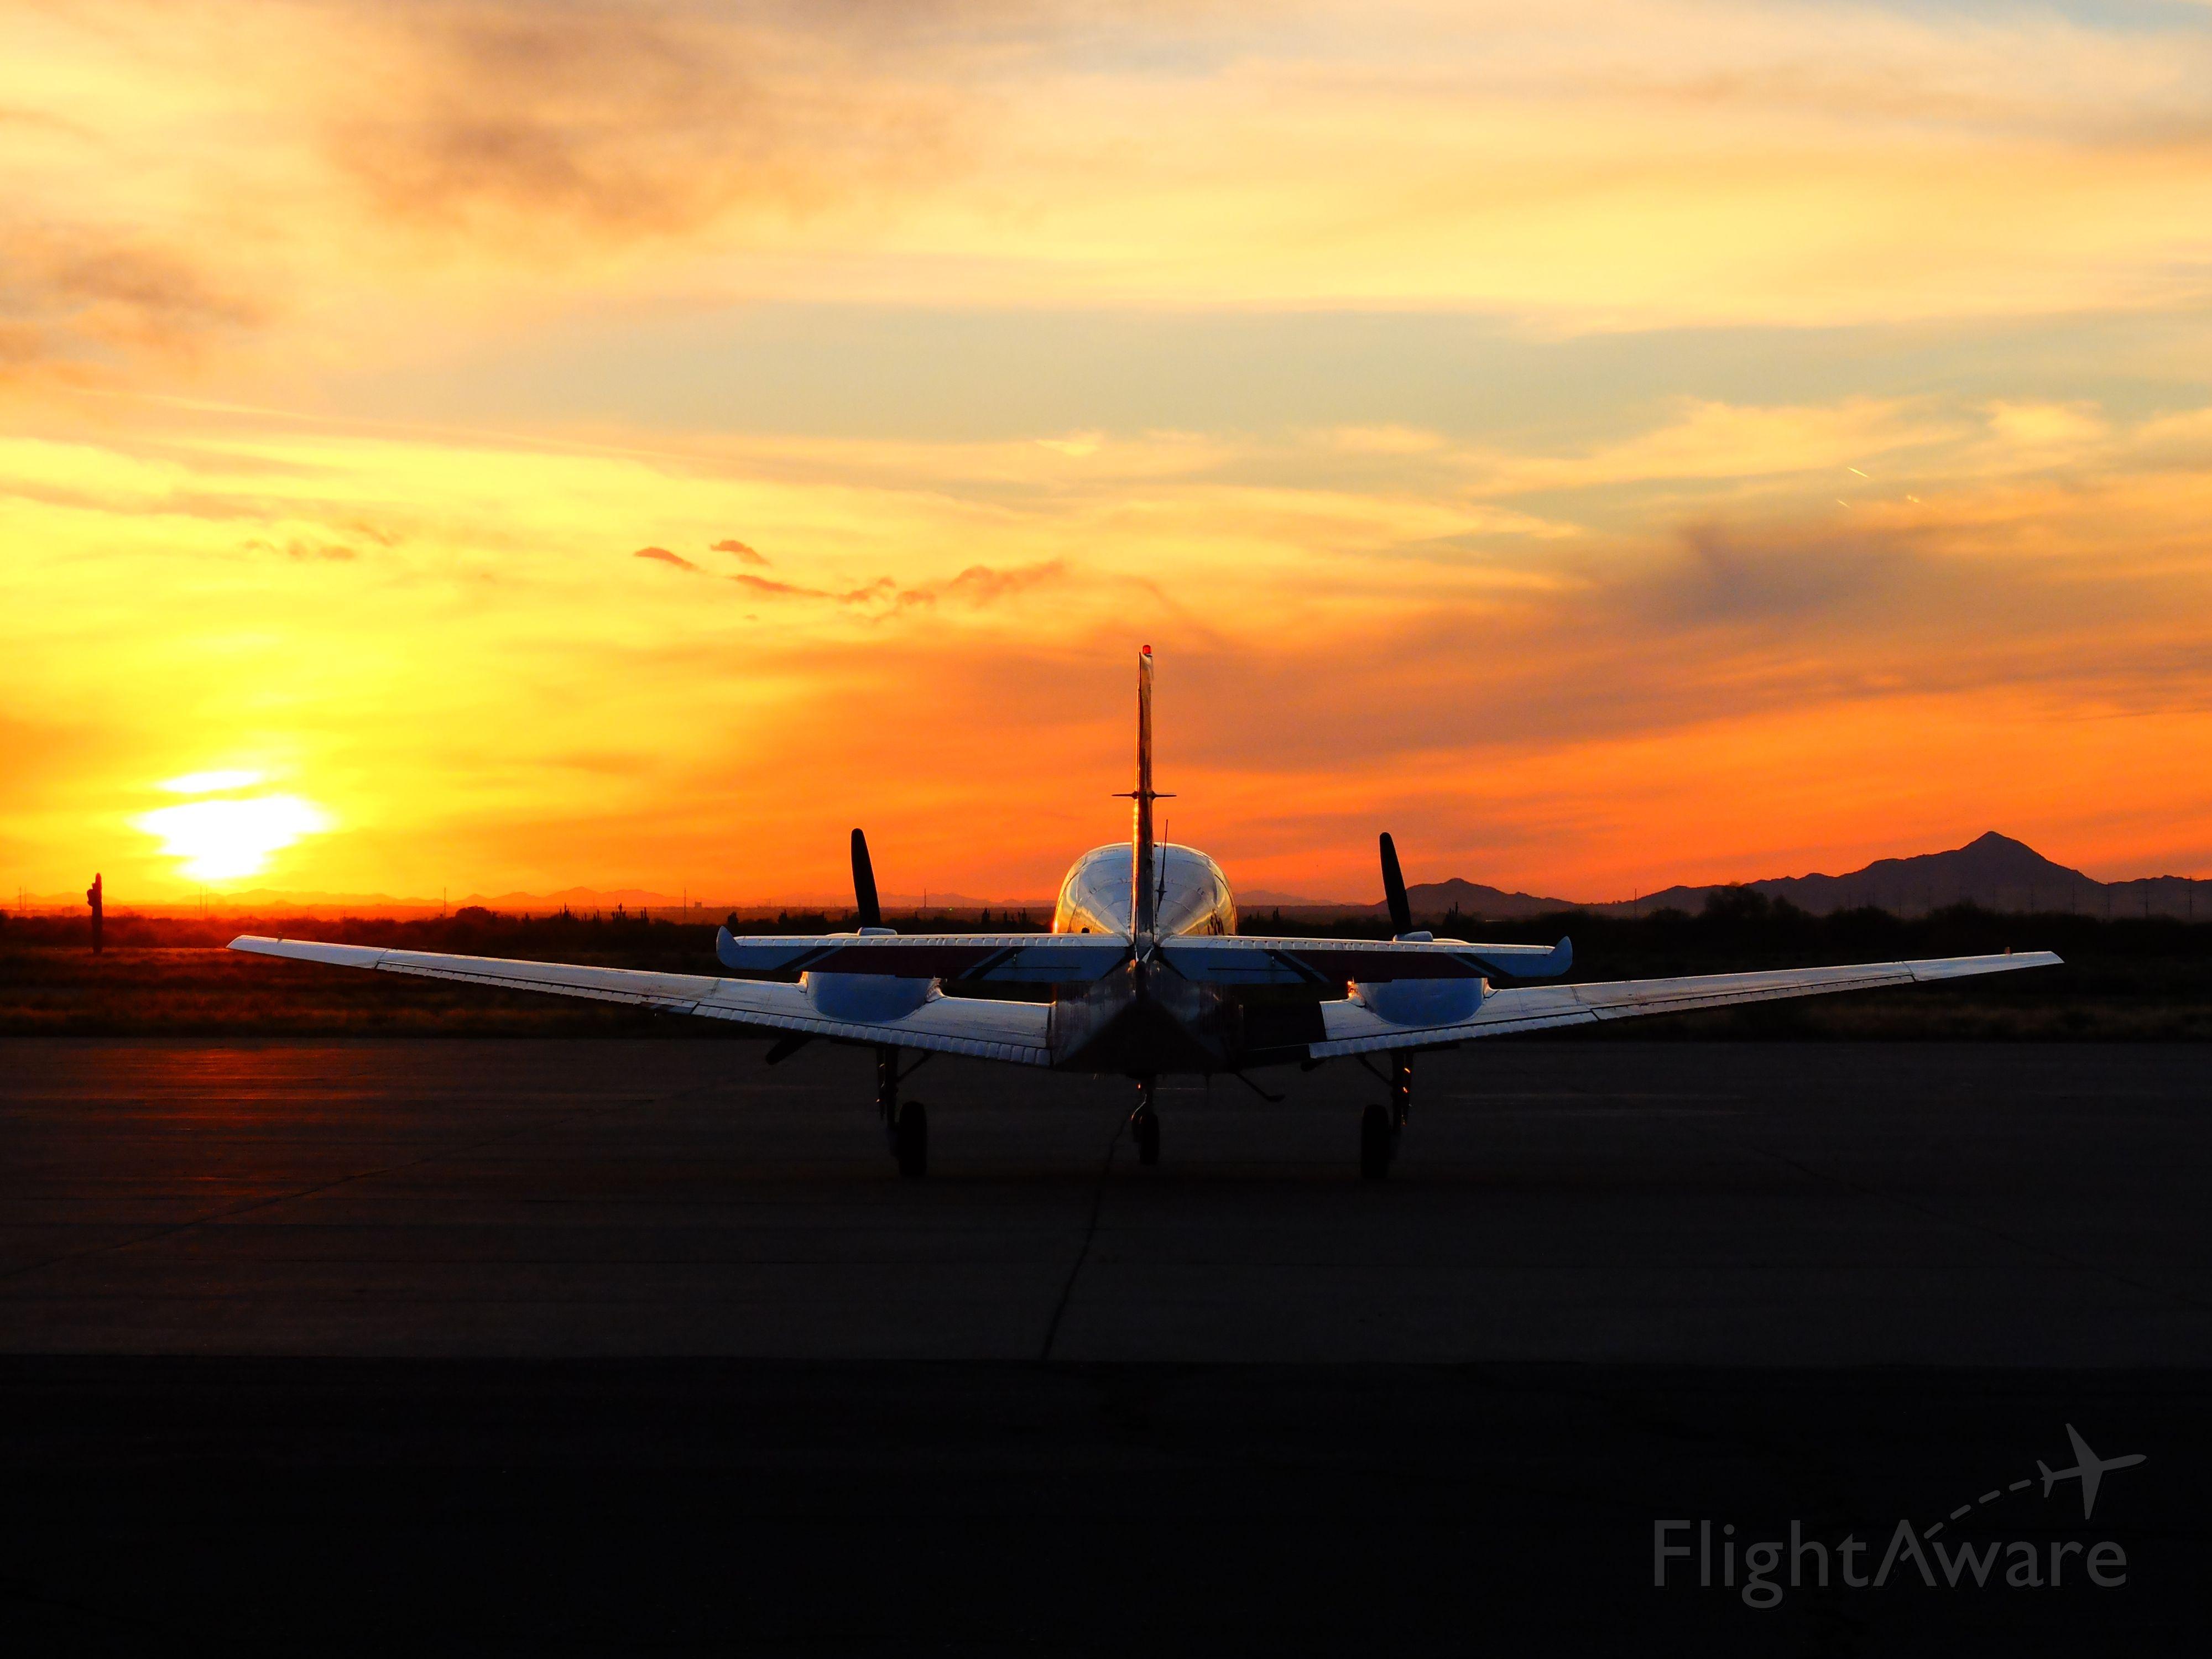 Beechcraft 55 Baron (N177AB) - N177AB at P08 sunset